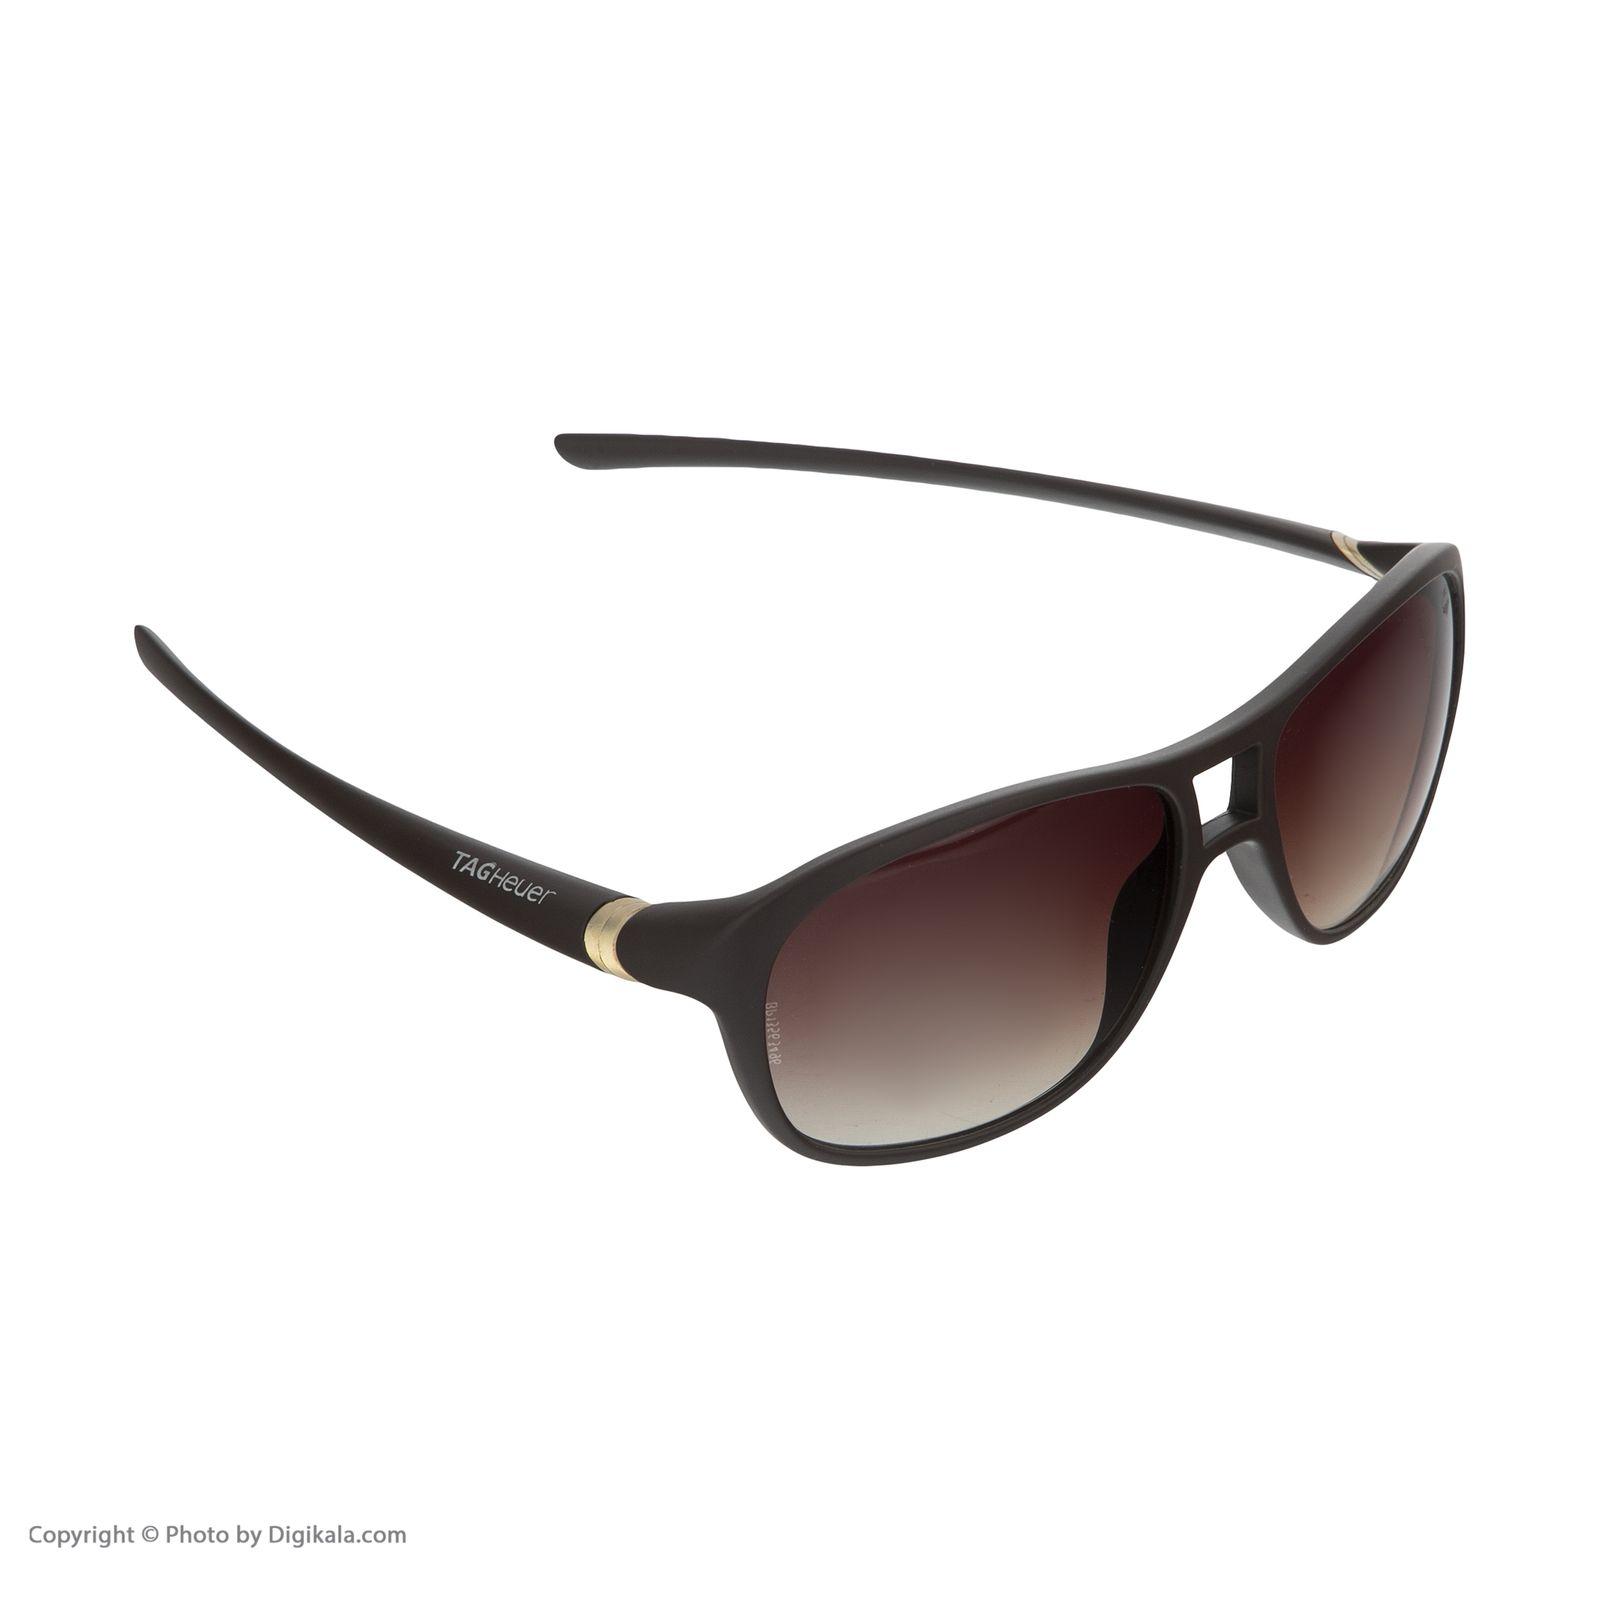 عینک آفتابی تگ هویر مدل 6043 -  - 6